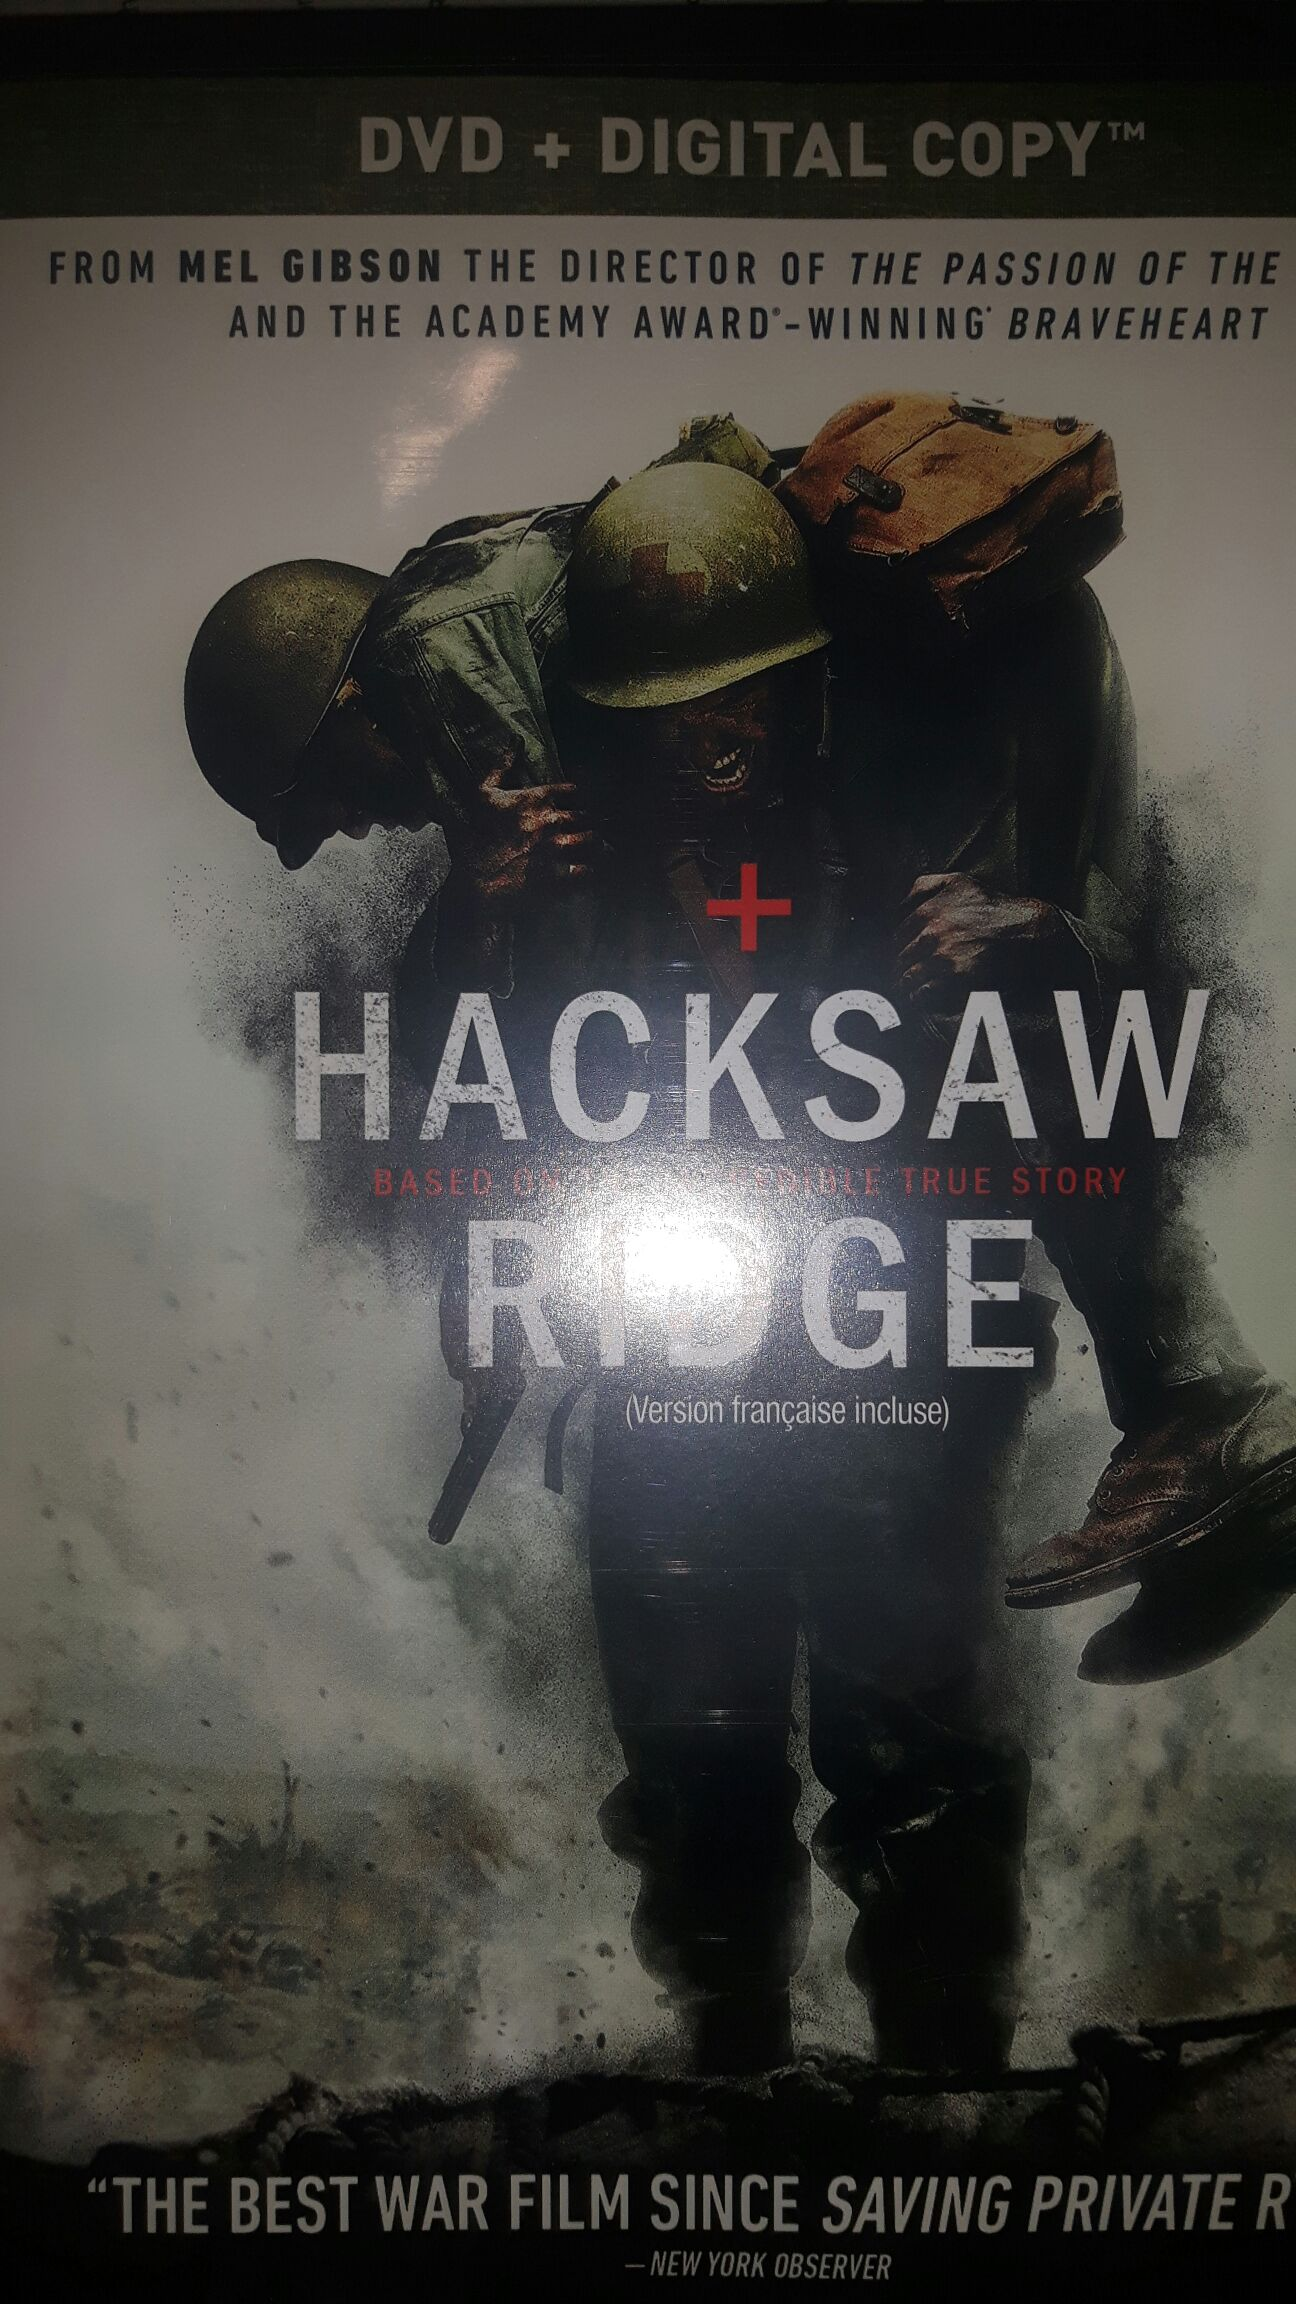 Hacksaw Ridge - DVD cover